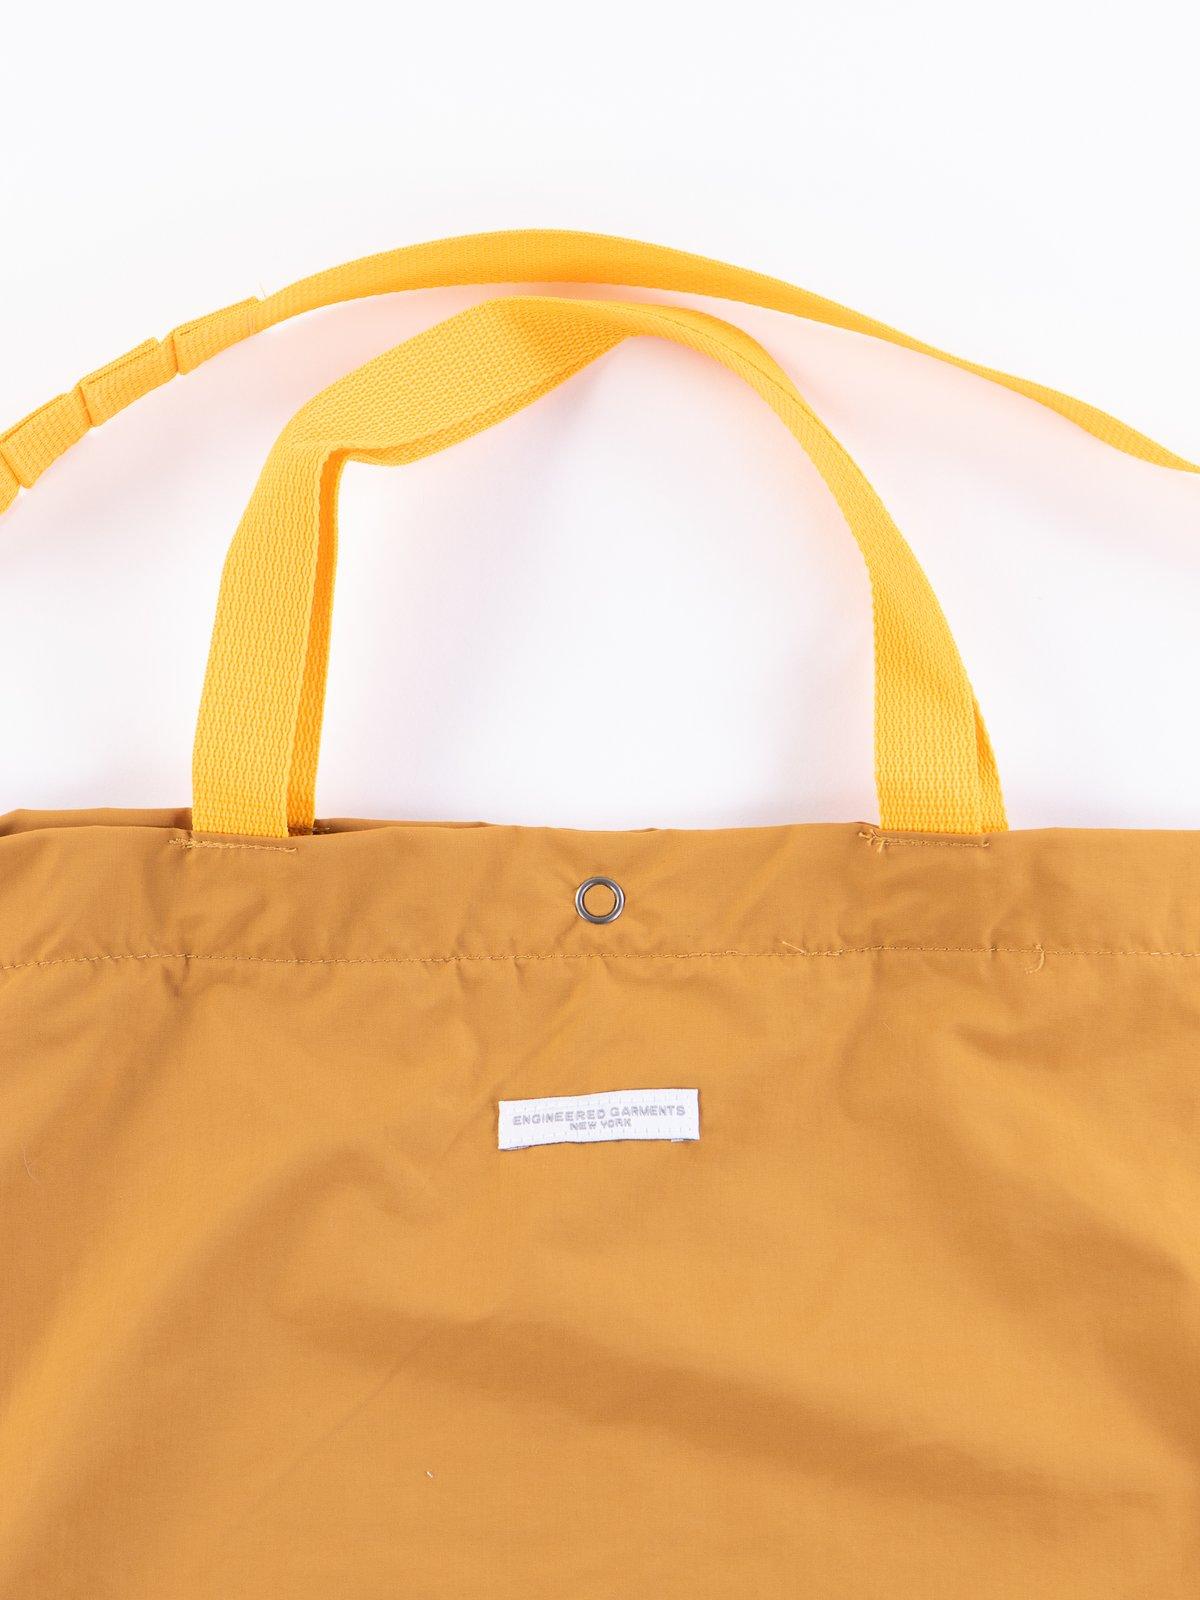 Mustard Acrylic Coated Nylon Taffeta Carry All Tote - Image 3